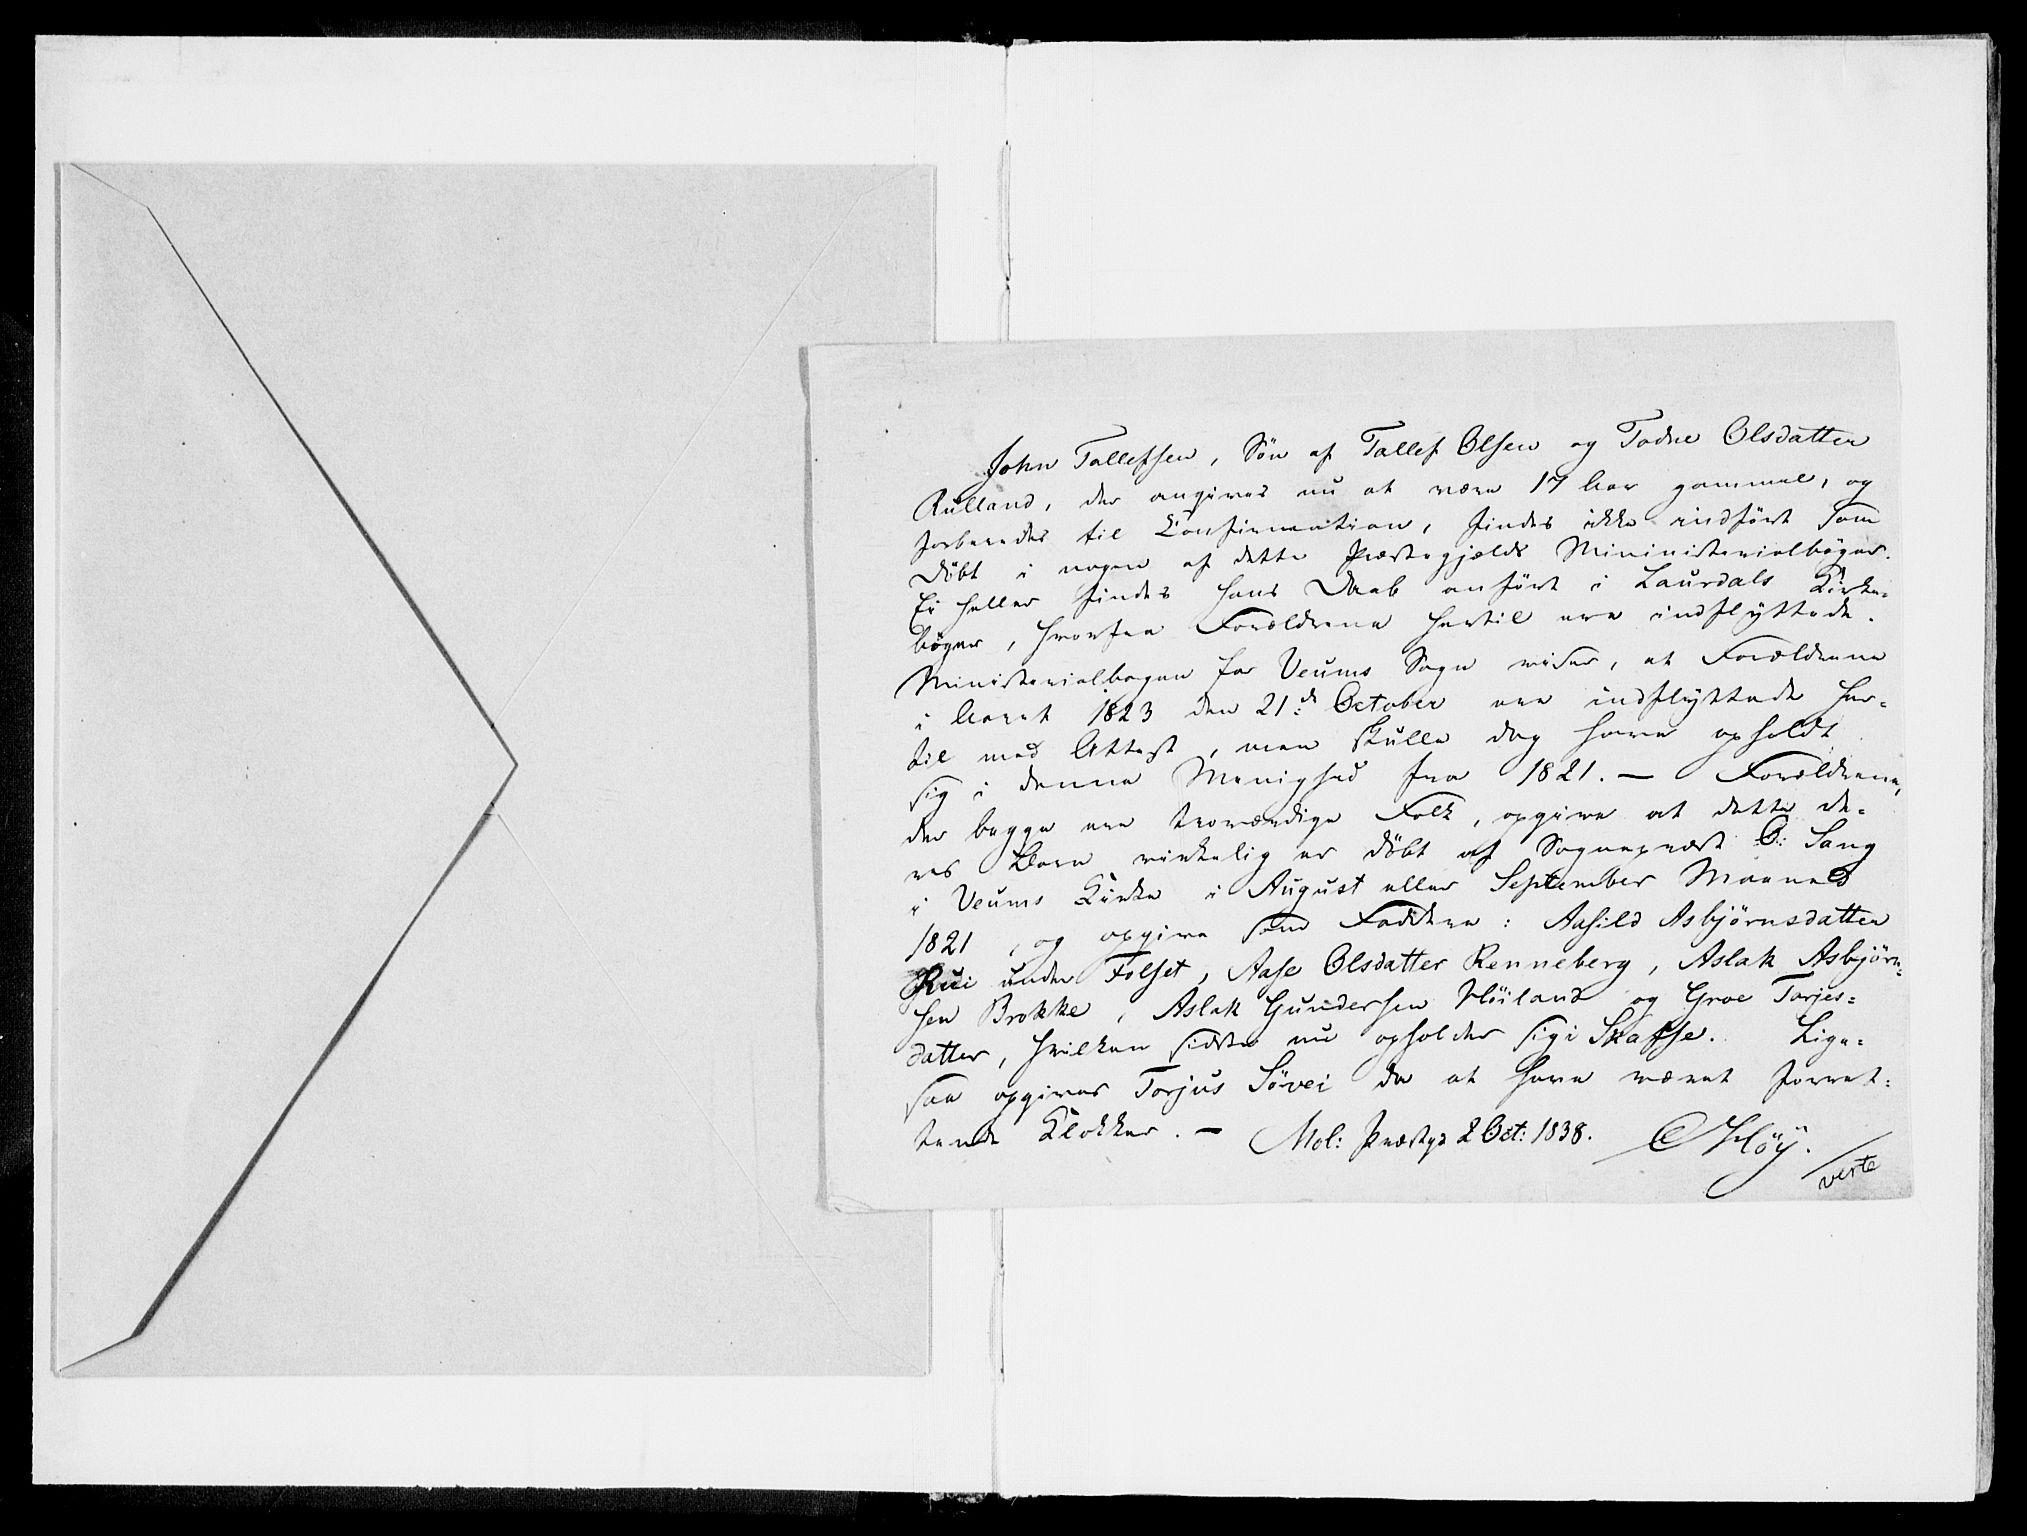 SAKO, Fyresdal kirkebøker, F/Fb/L0001: Parish register (official) no. II 1, 1815-1854